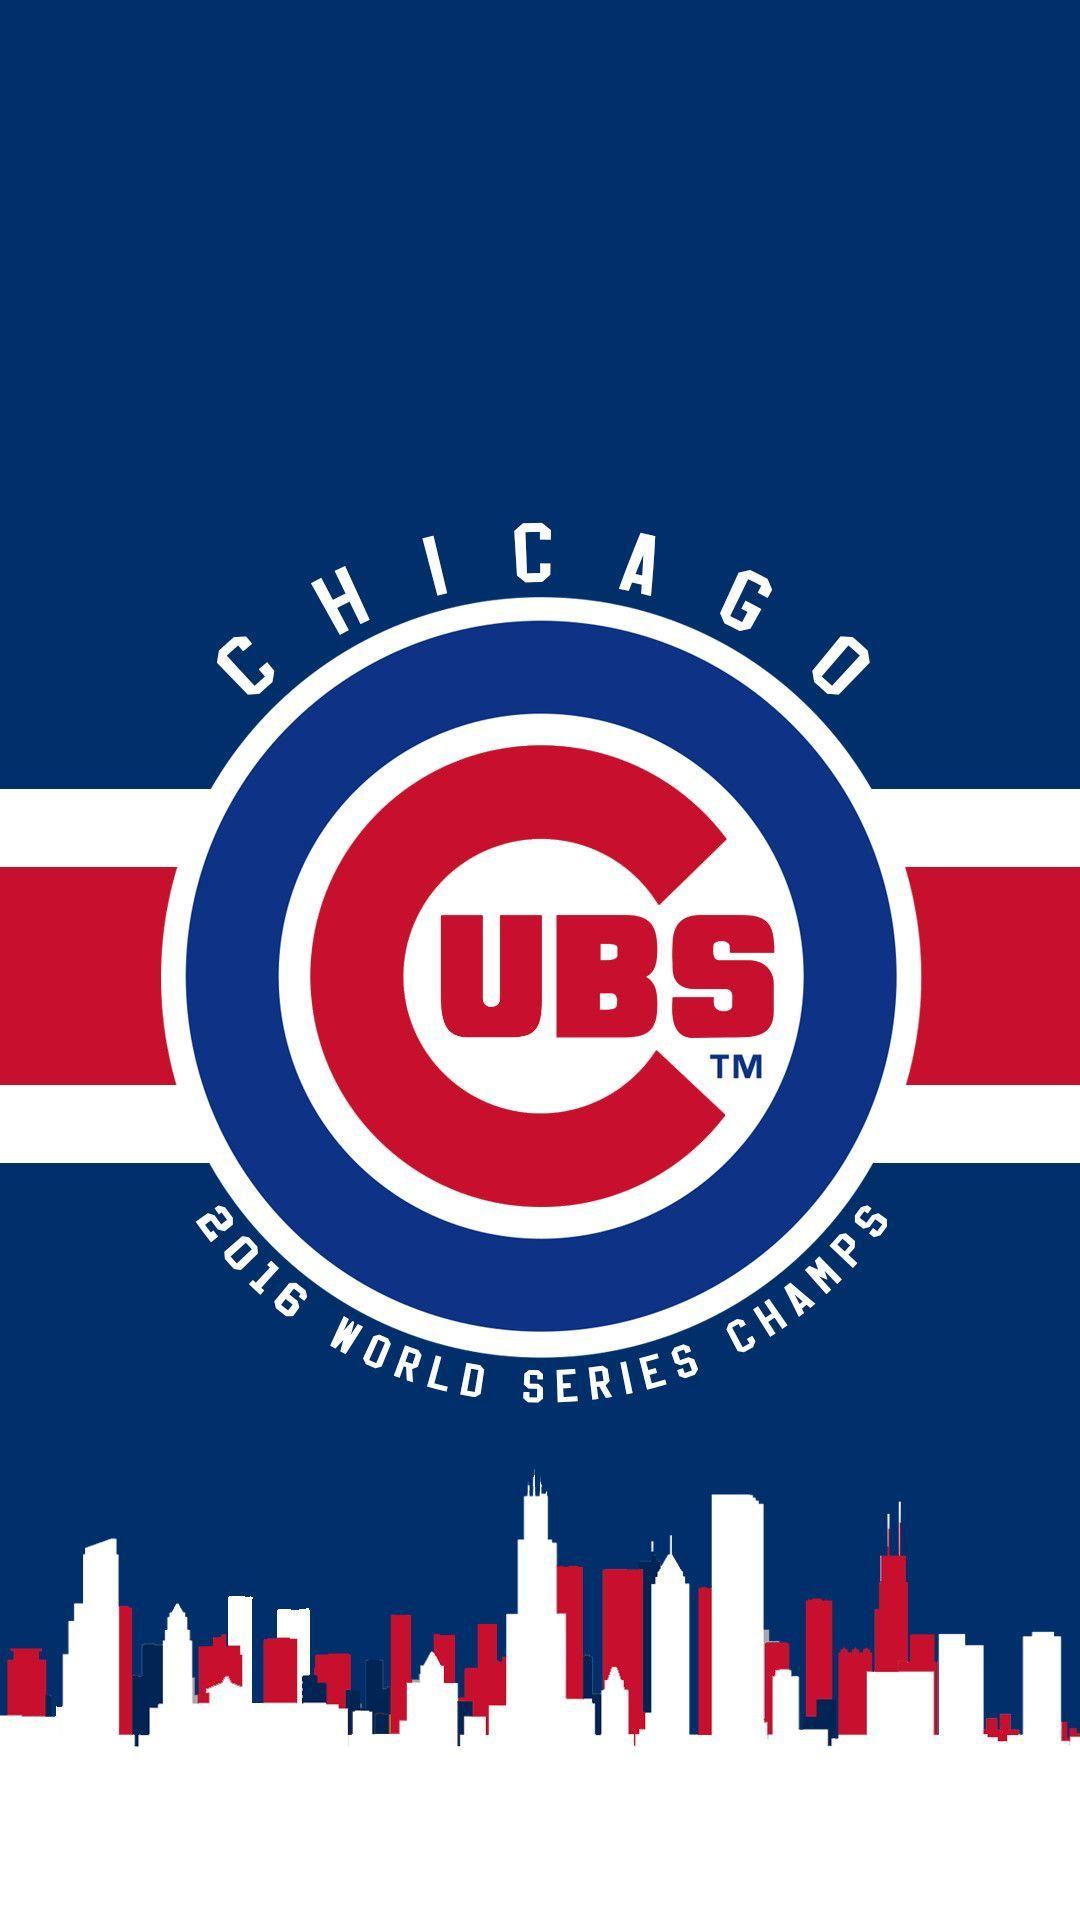 Wallpapers Wallpaper Chicago Cubschicago Cubs Wallpaper Chicago Cubs Wallpaperchicago Cubs Wallpaper In 2020 Chicago Cubs Wallpaper Cubs Wallpaper Chicago Cubs